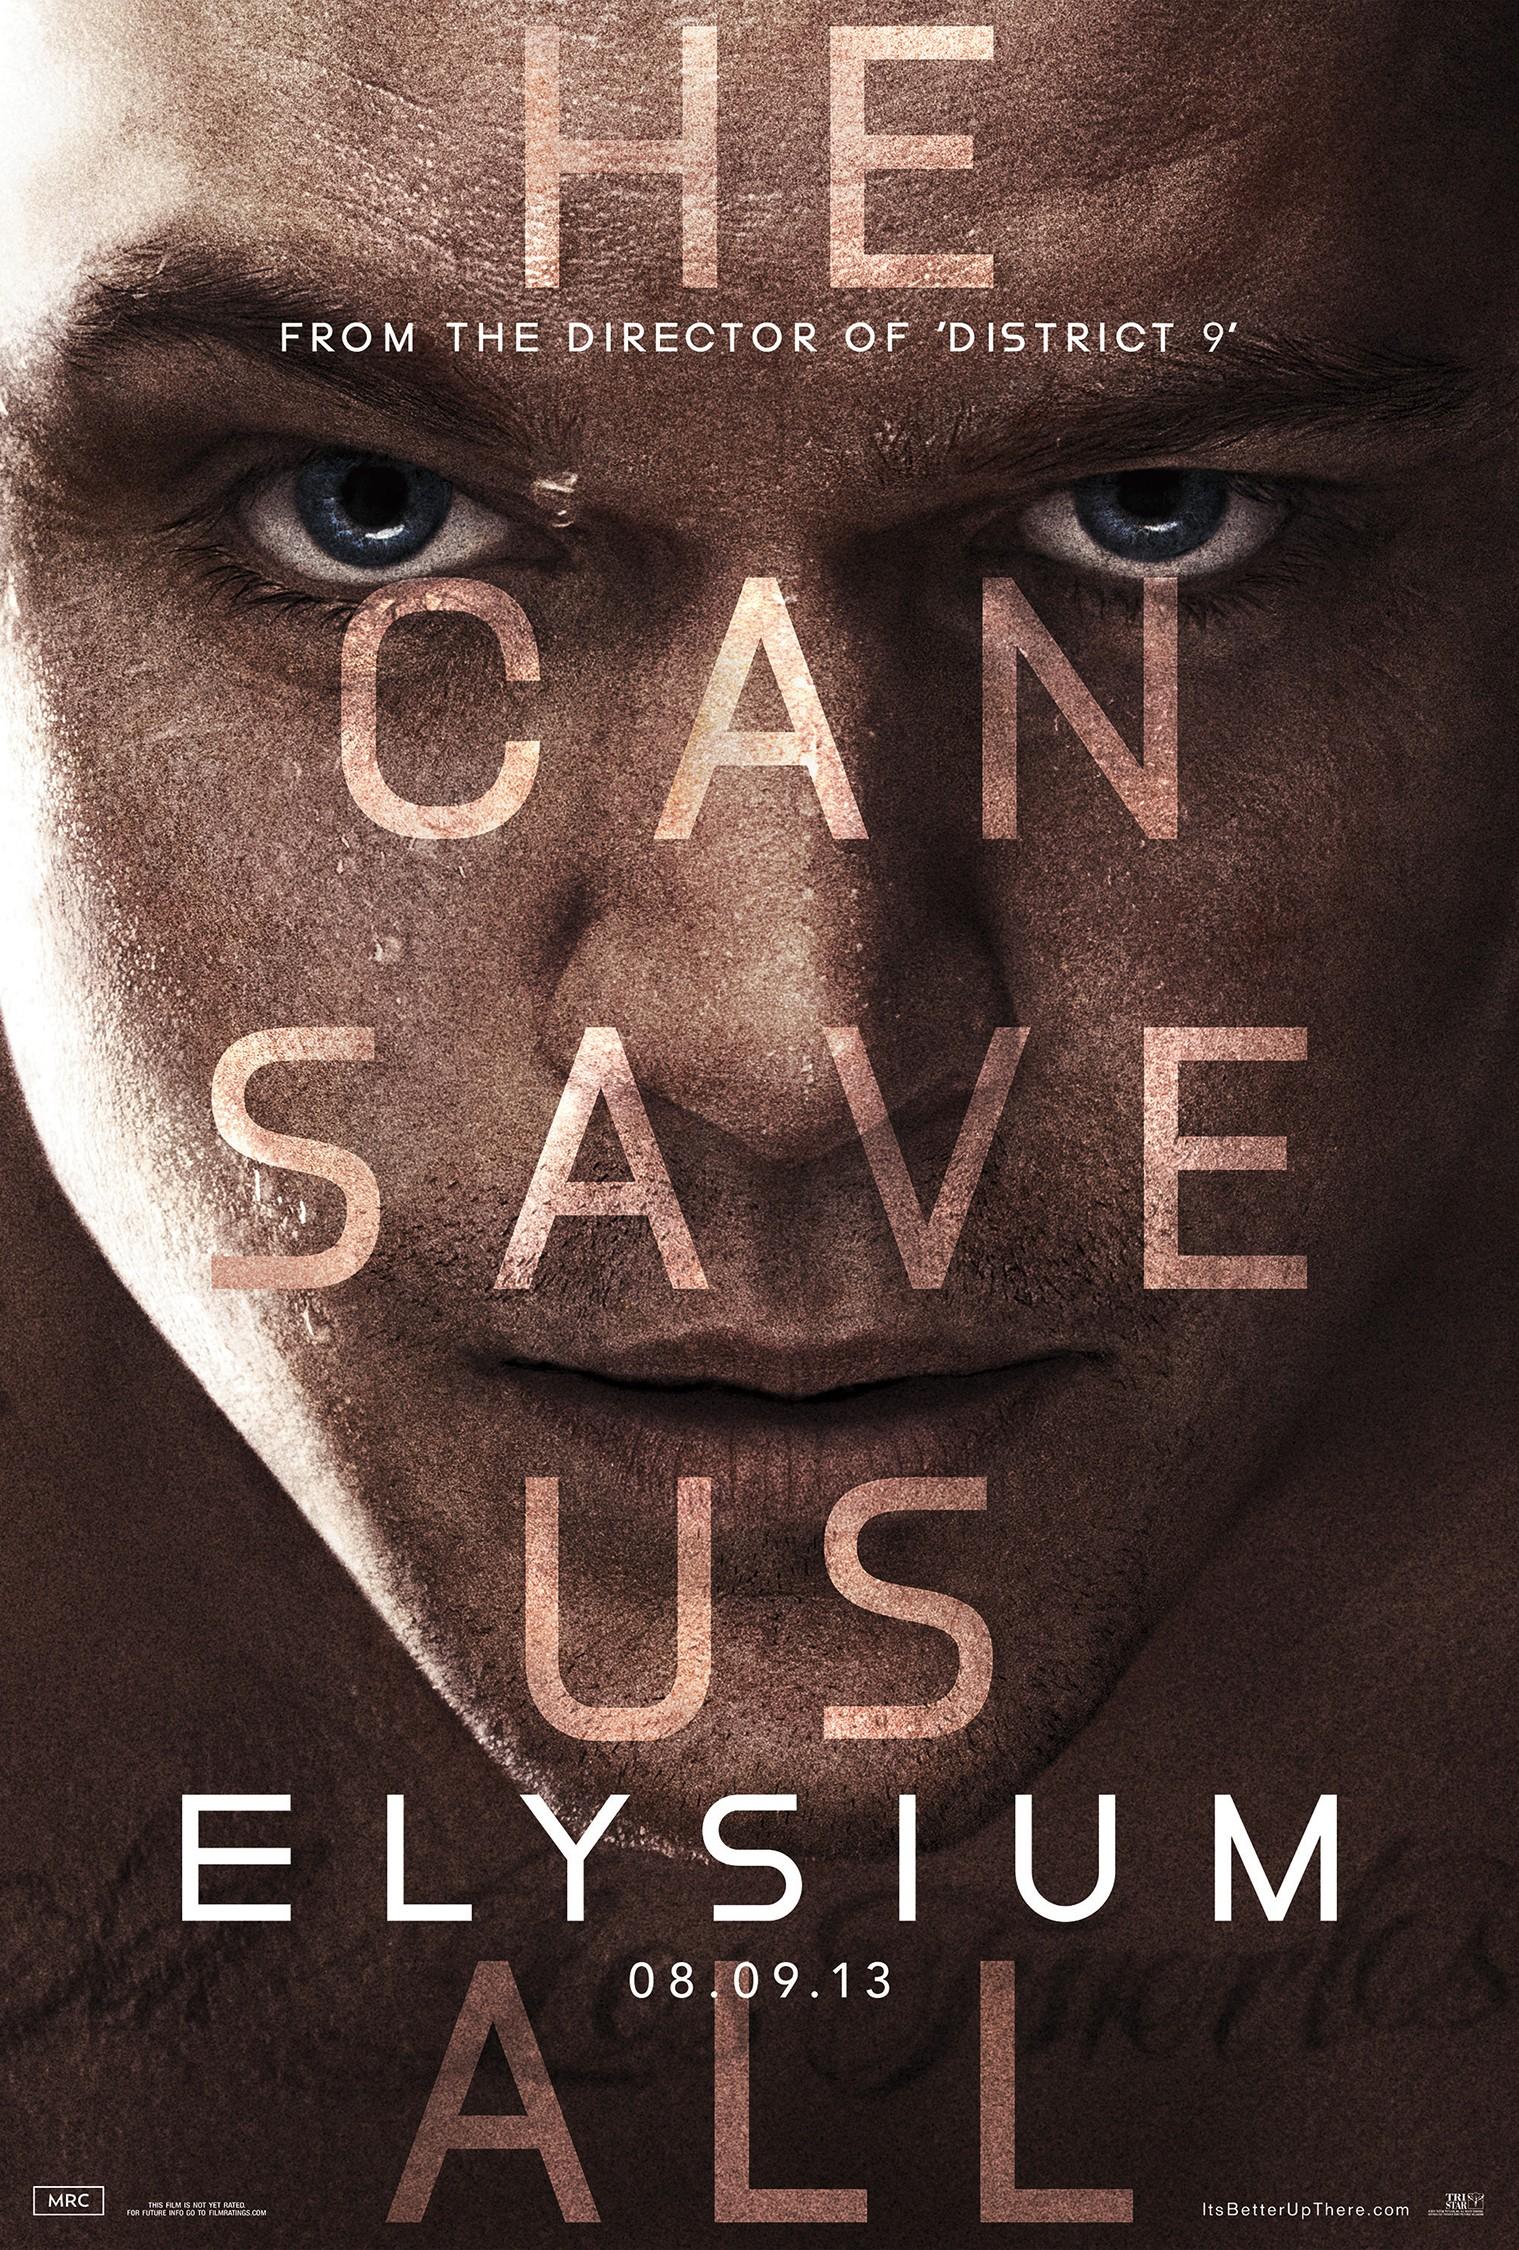 Elysium - Poster - 003